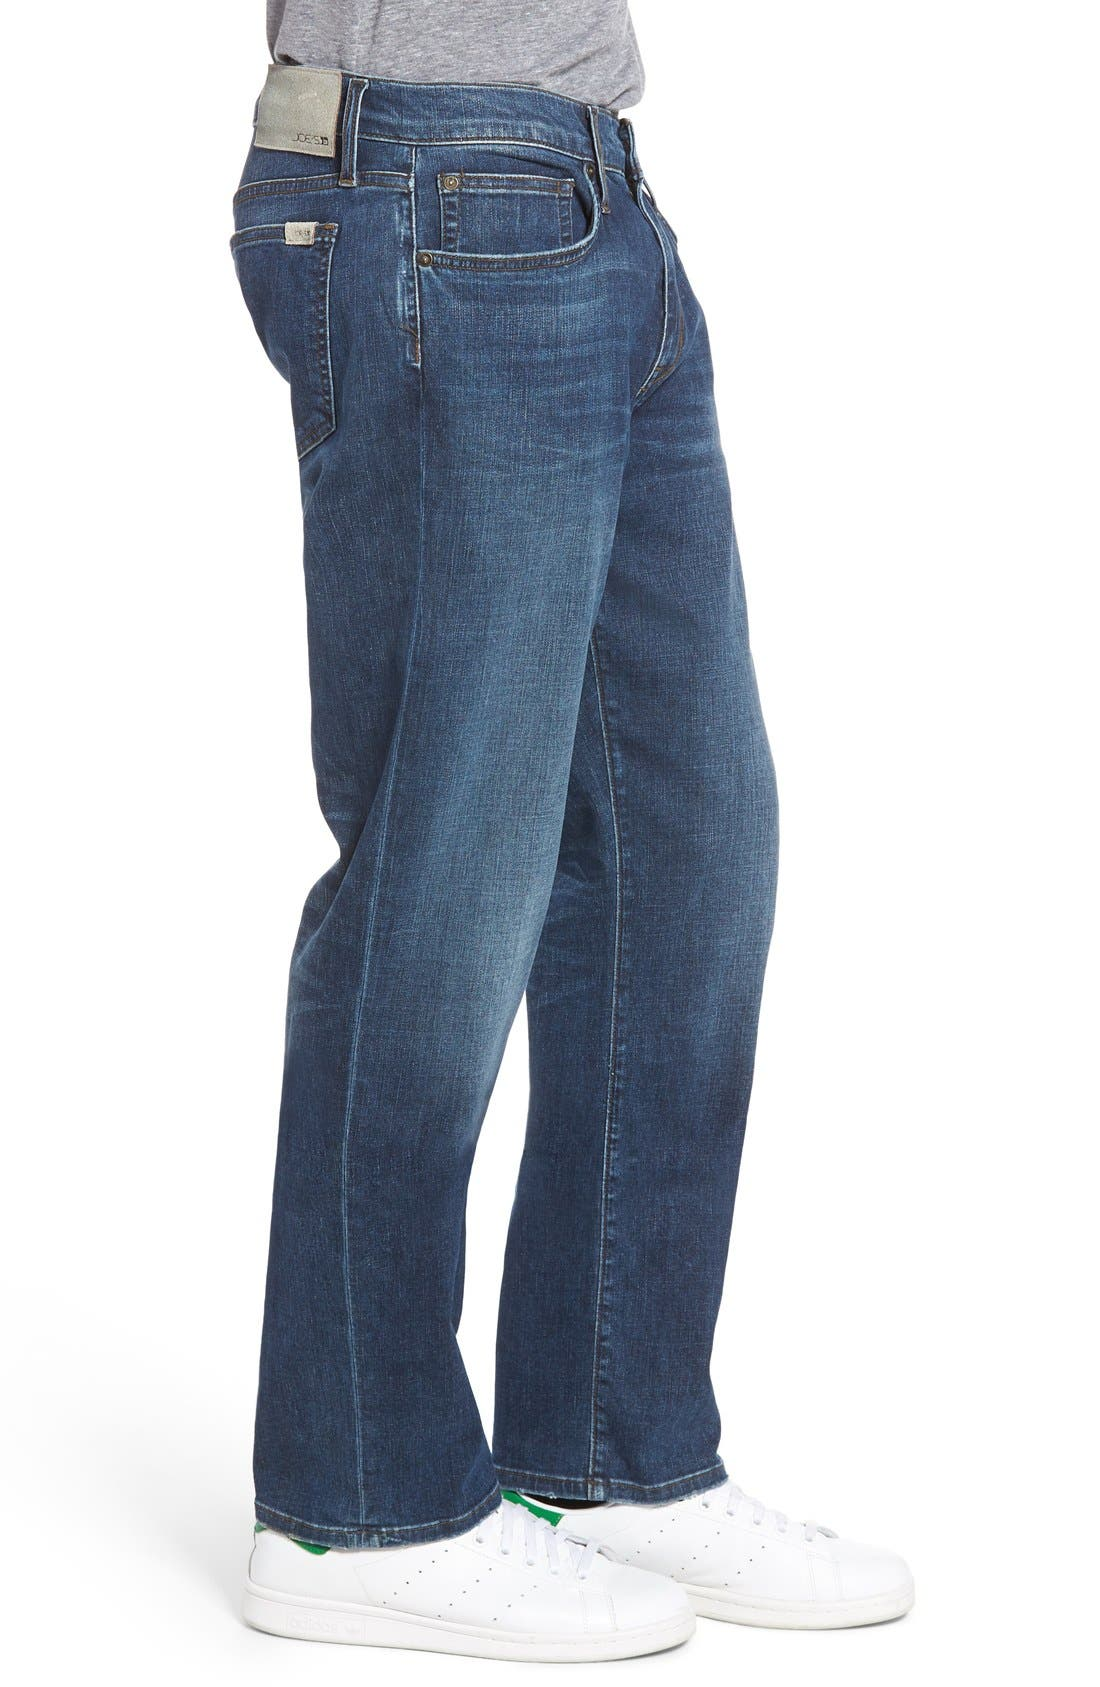 Brixton Slim Fit Jeans,                             Alternate thumbnail 3, color,                             Gladwin